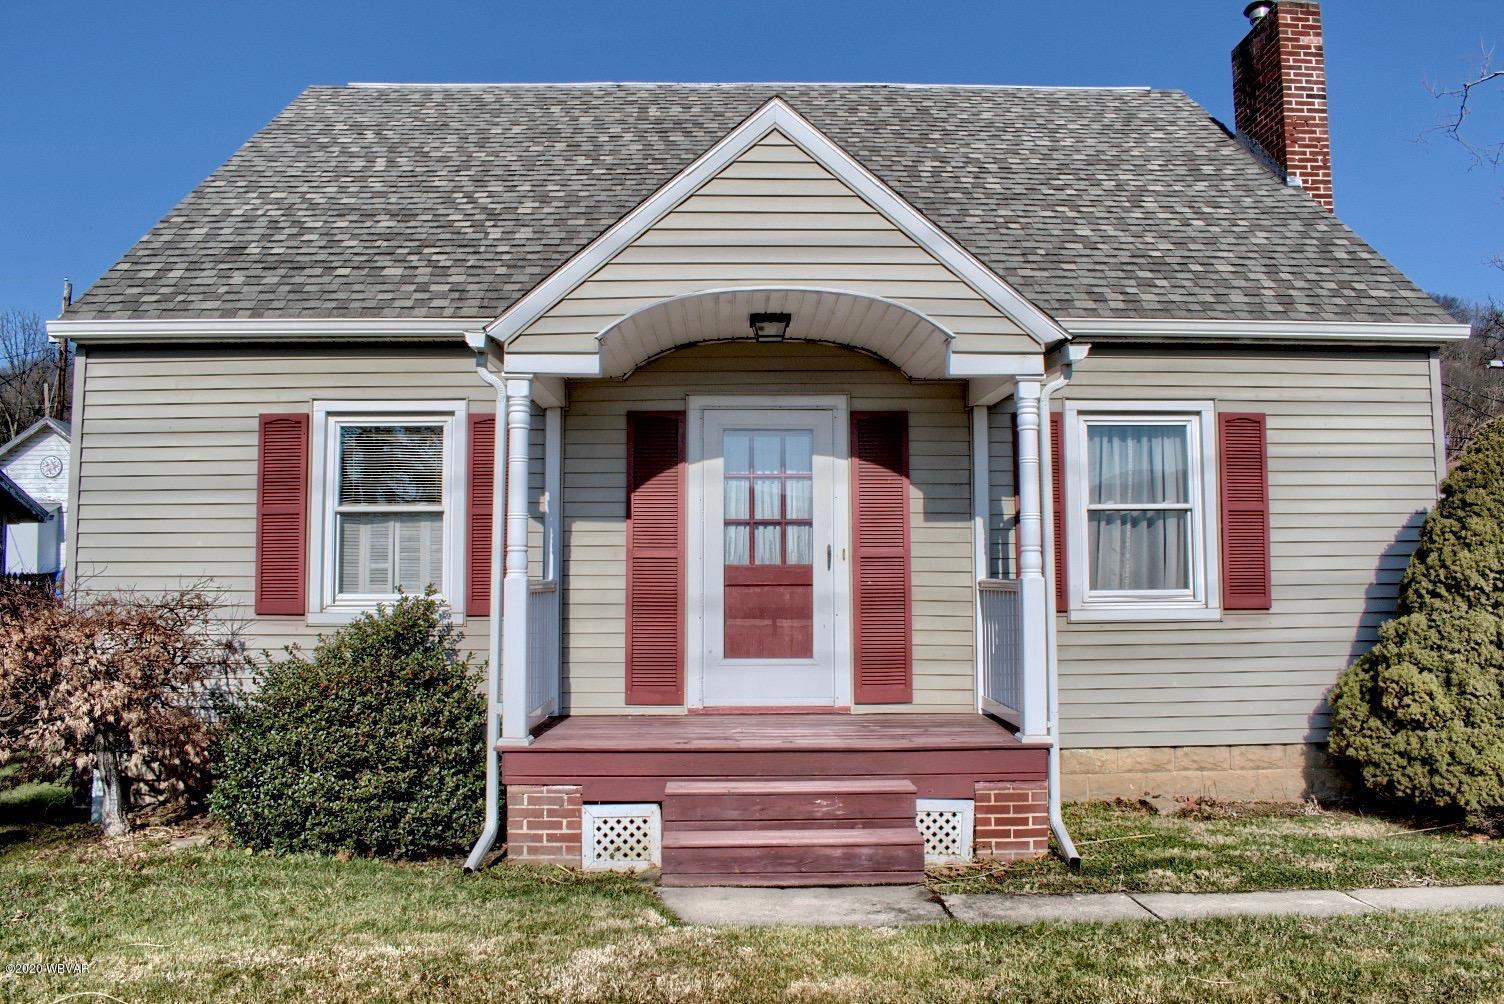 153 1ST STREET,Linden,PA 17744,4 Bedrooms Bedrooms,2 BathroomsBathrooms,Residential,1ST,WB-89389